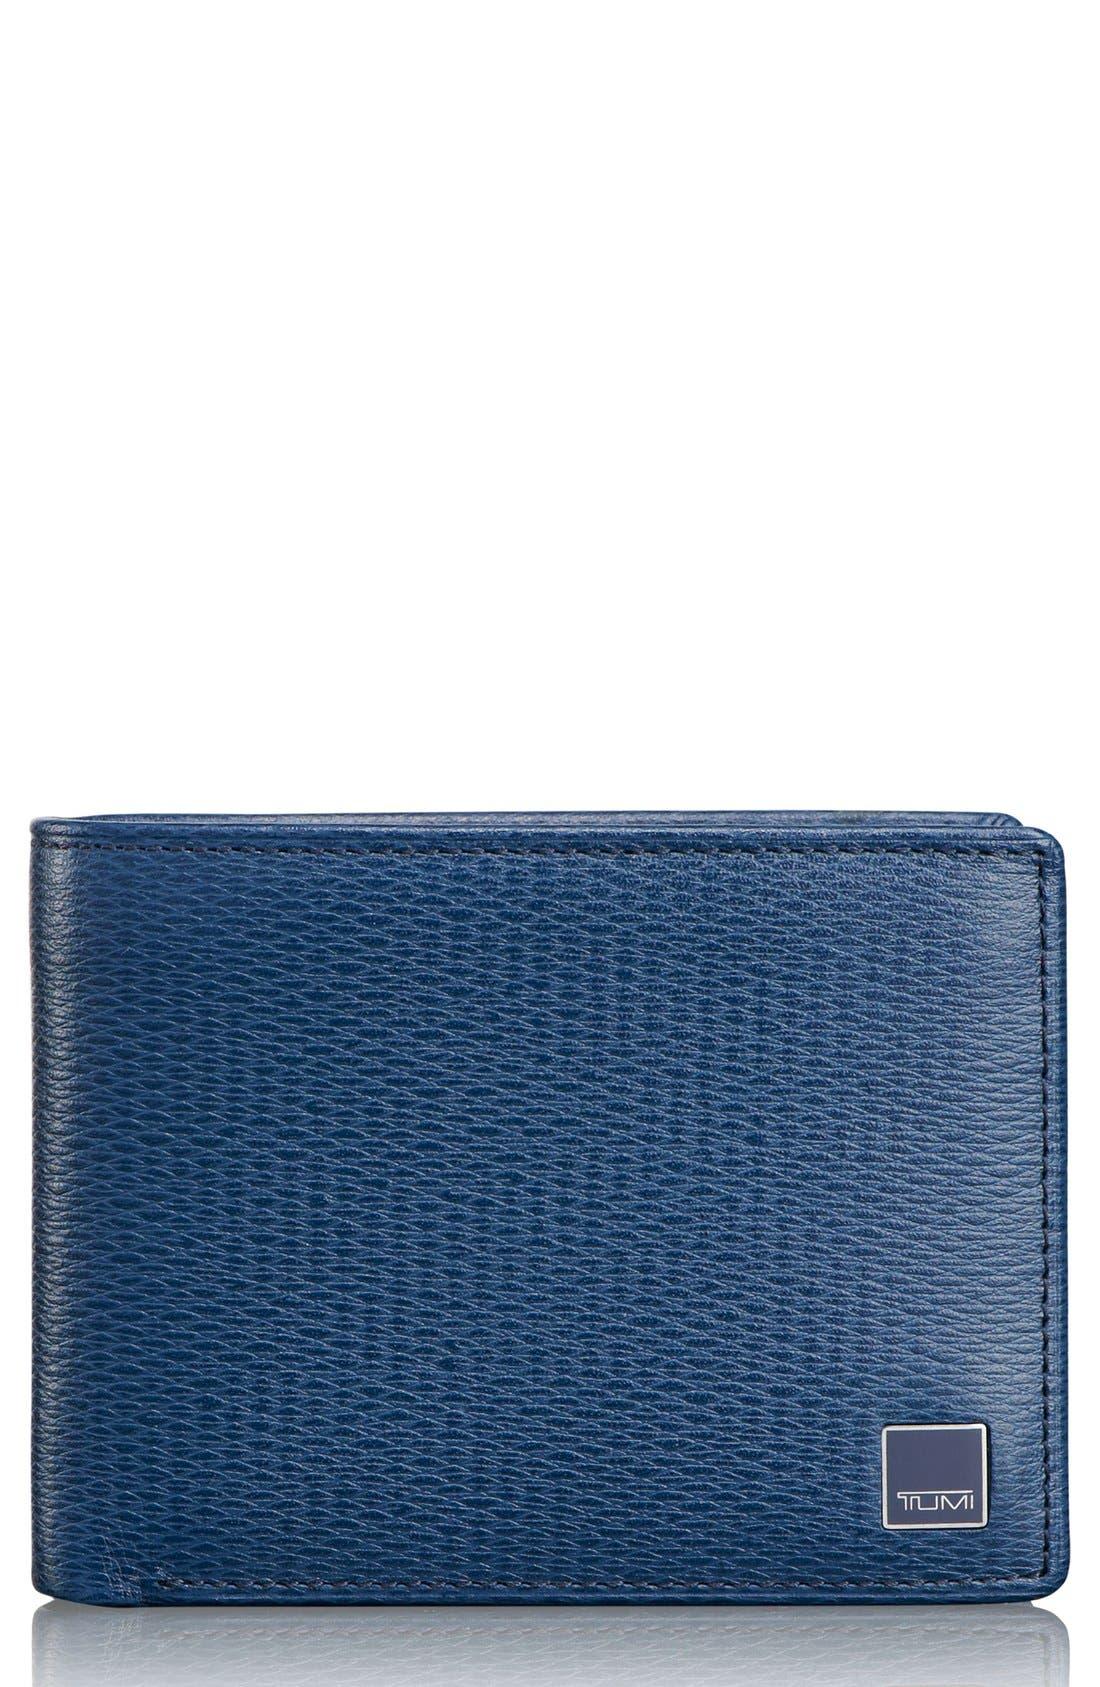 Alternate Image 1 Selected - Tumi 'Monaco' Double Billfold Wallet